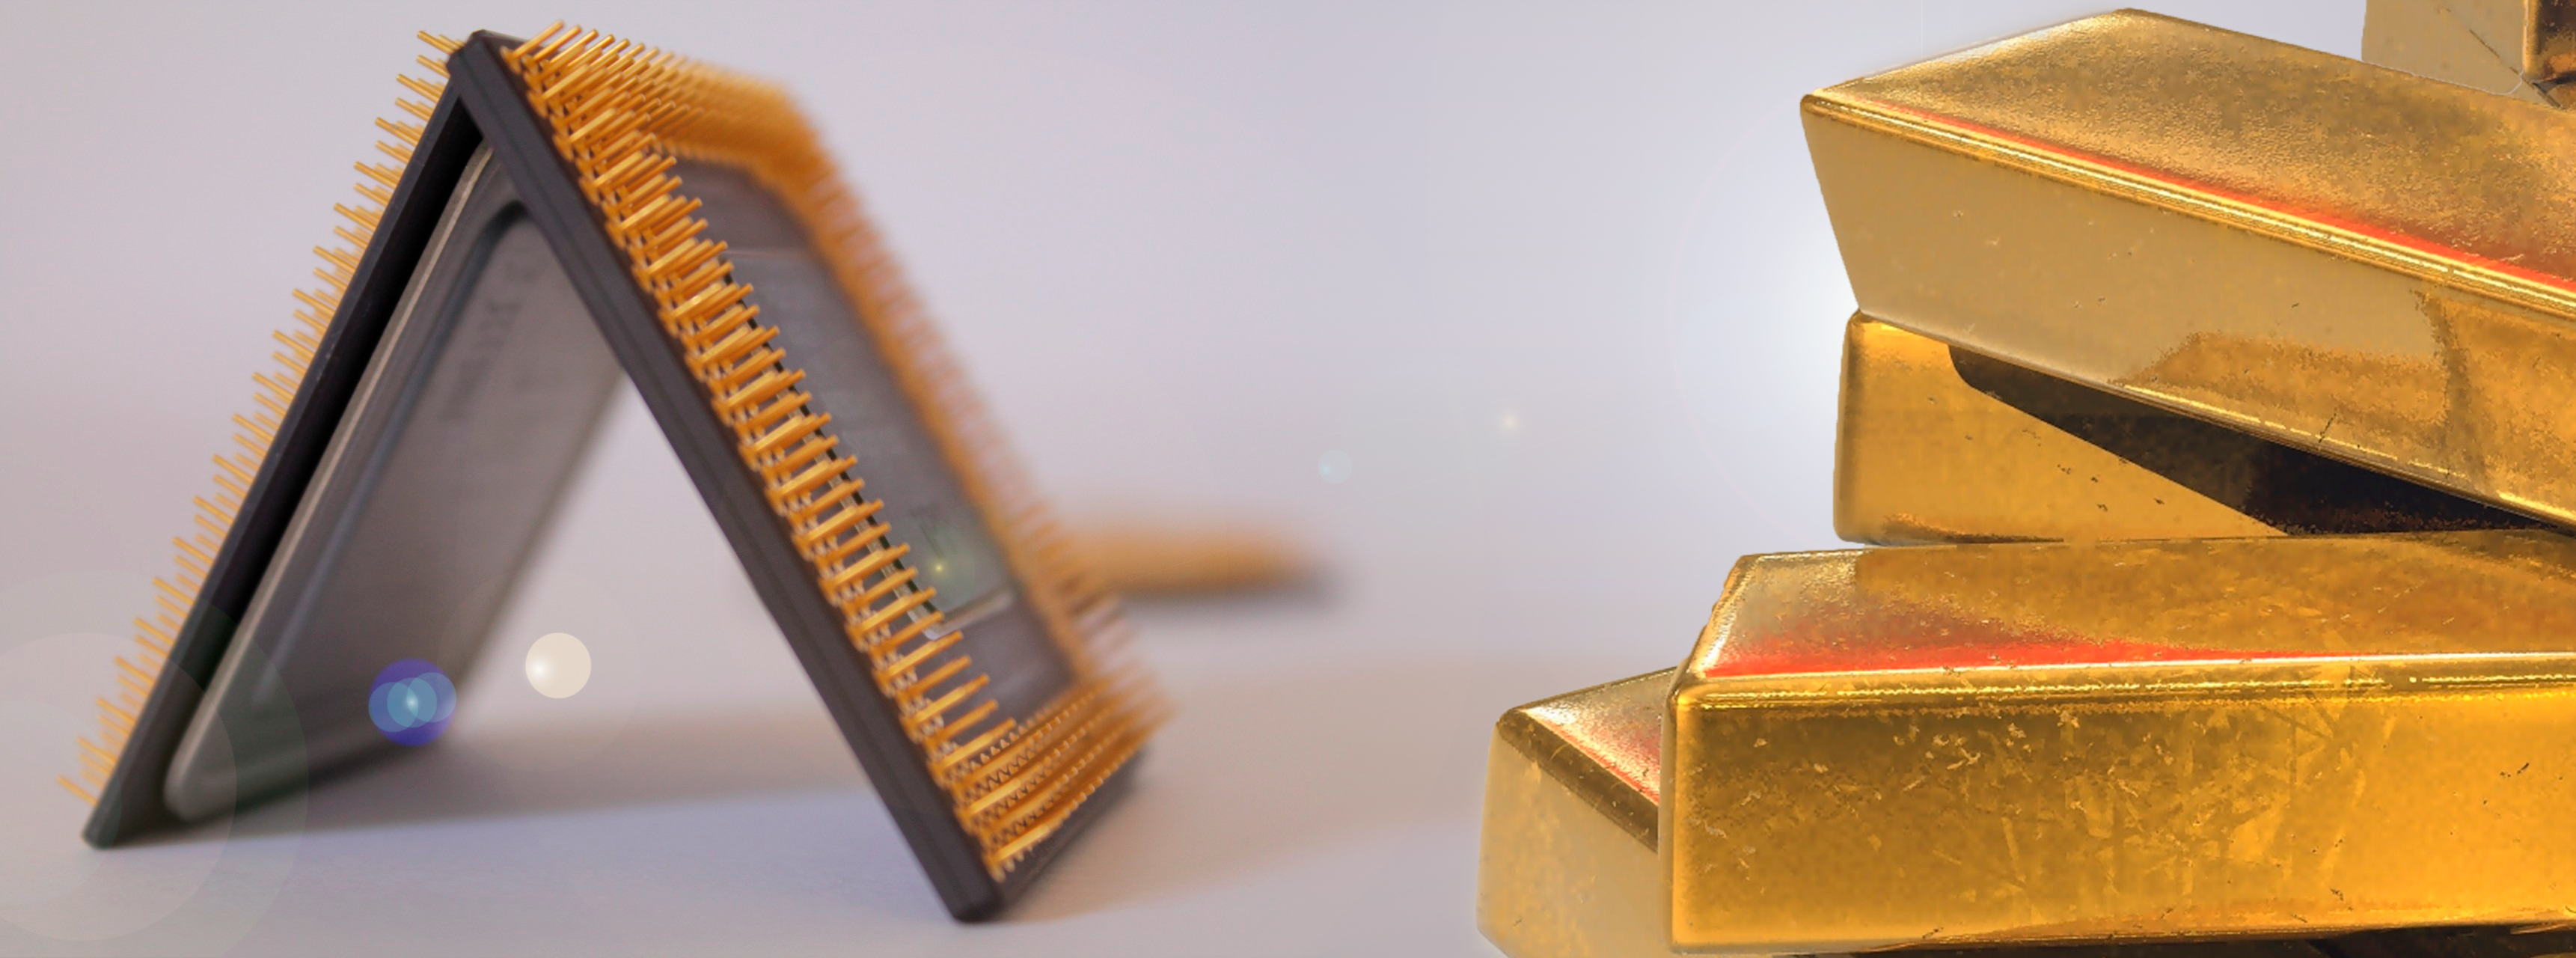 Data platform renewal as the golden opportunity